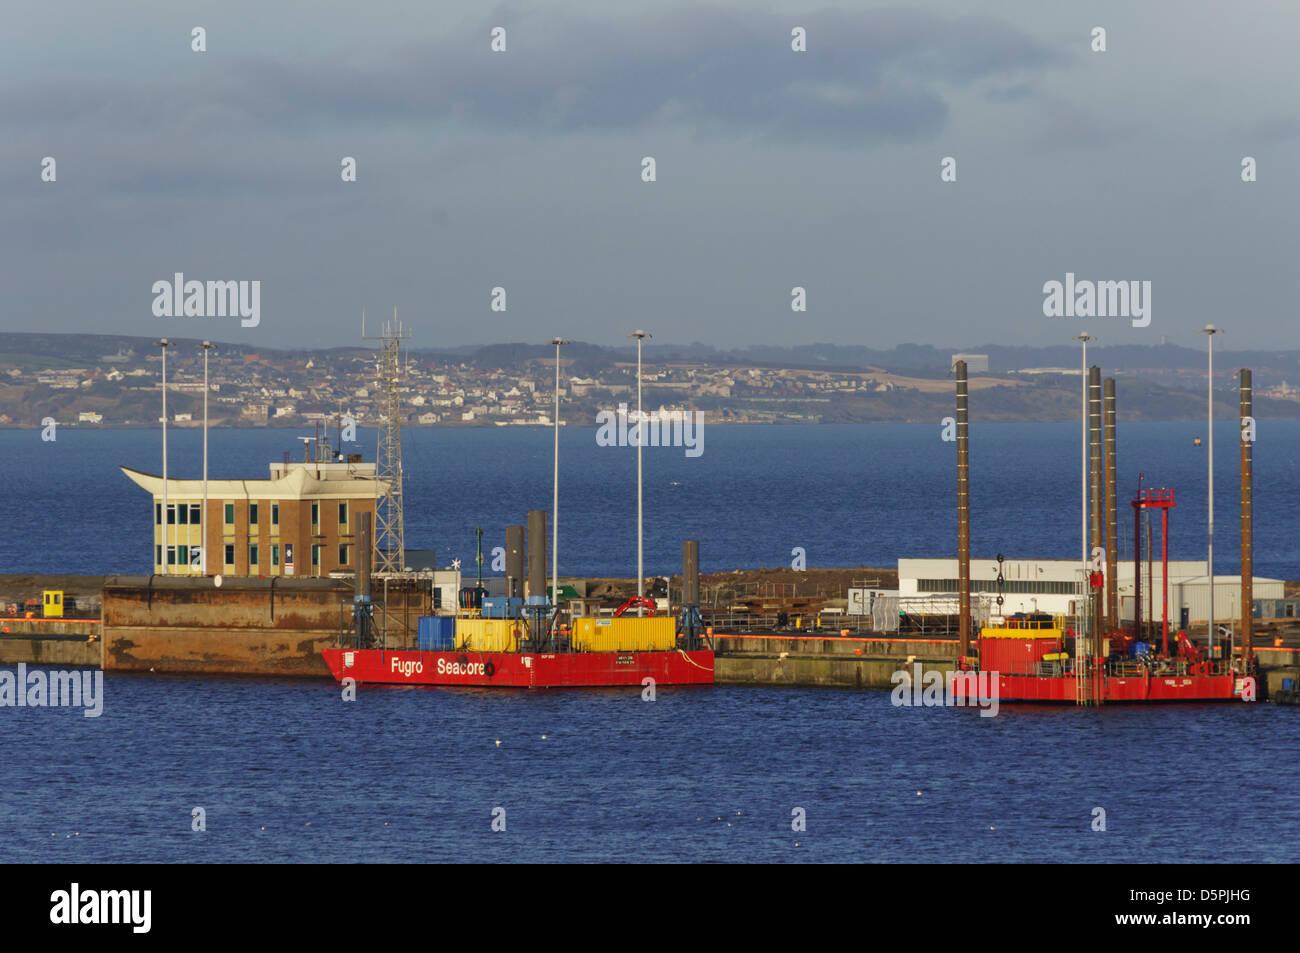 Fugro Seacore, container dock, Leith harbour Edinburgh Scotland - Stock Image